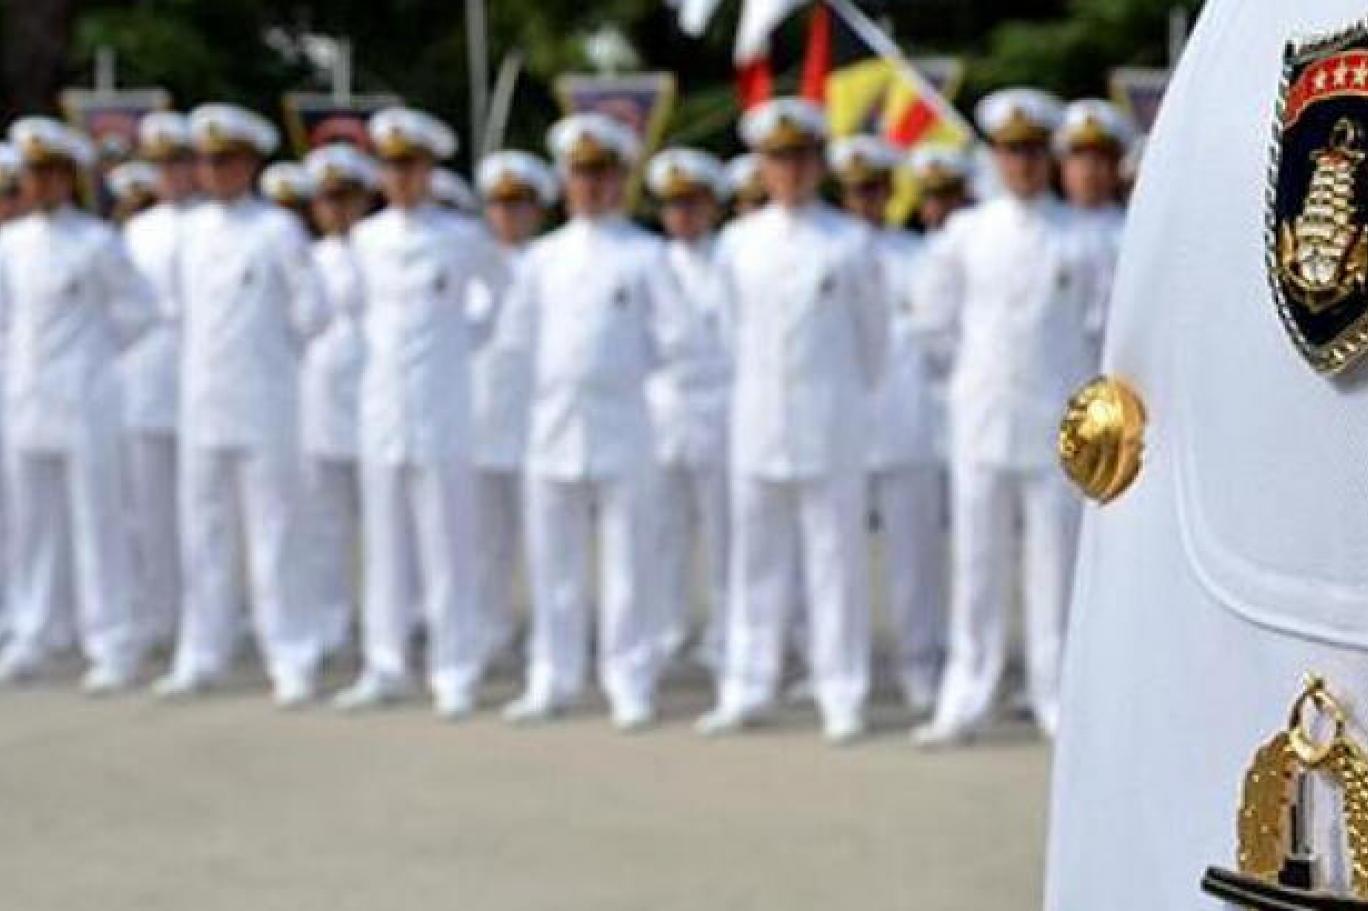 104 emekli amiralin imzasını taşıyan bir bildiri yayımlandı